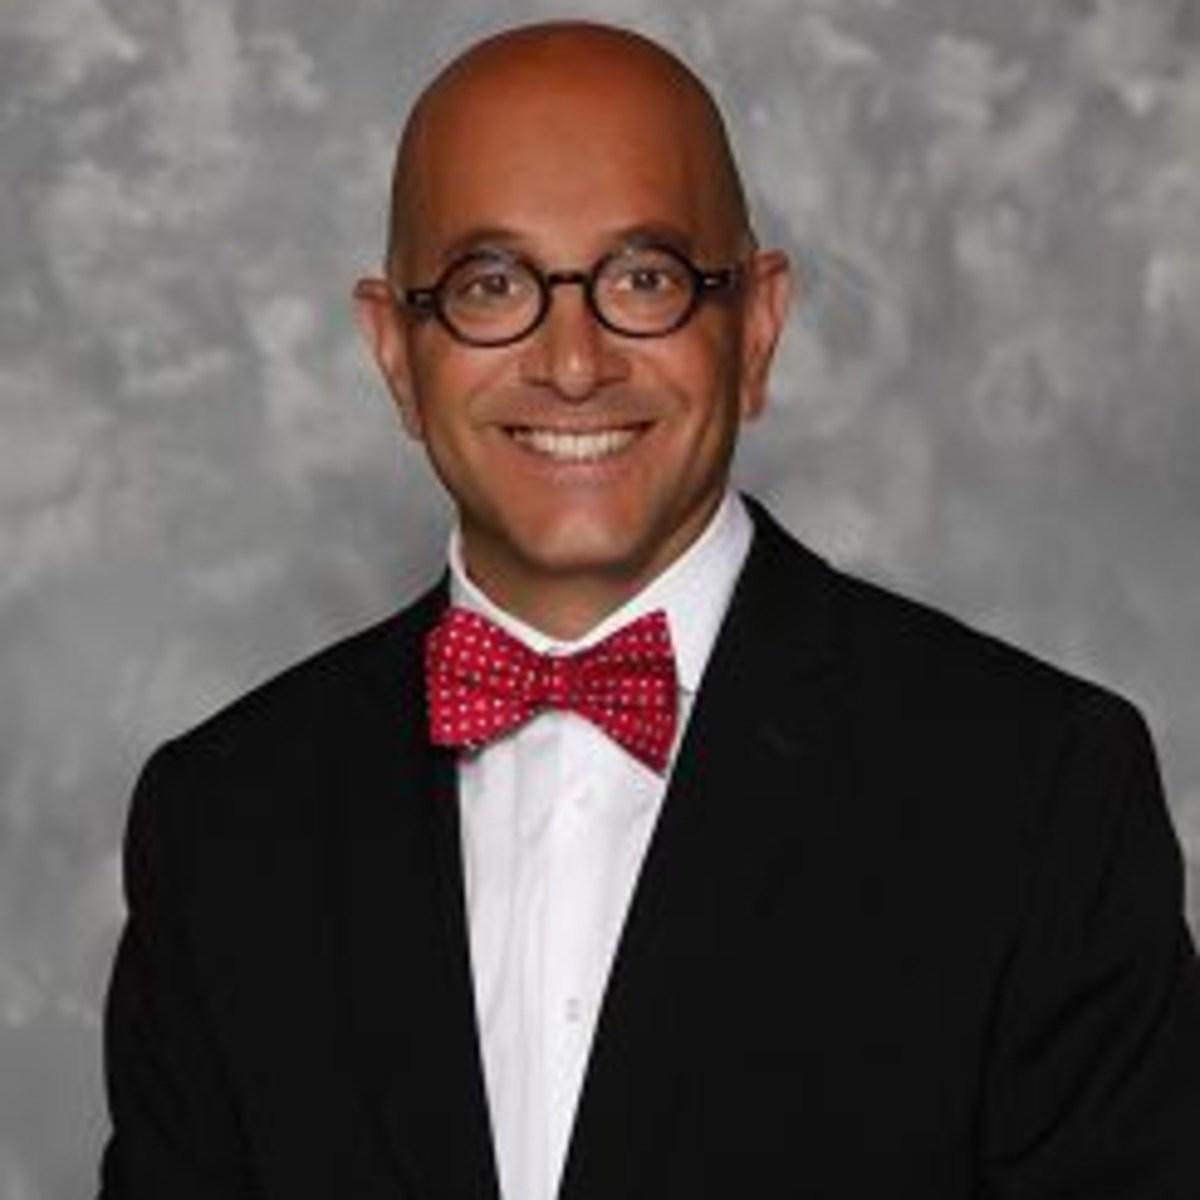 About Mr Feldman Tech Coach Fine Arts Instructional Coordinator